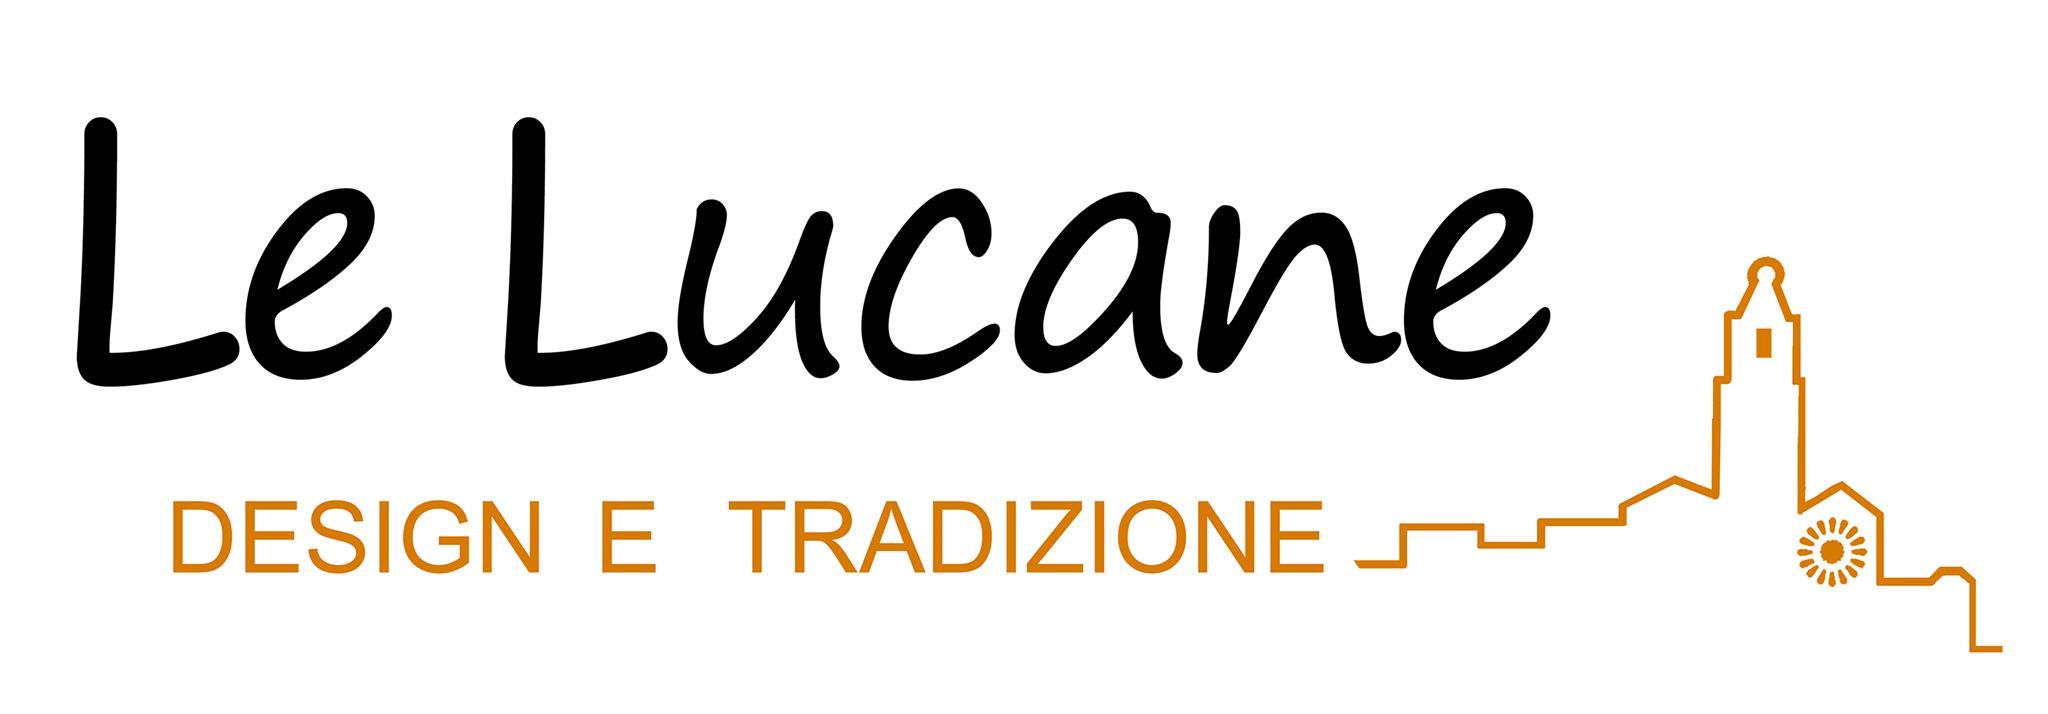 Le Lucane | vendita online: Prodotti Tipici Lucani – Souvenir Matera – Articoli Regalo-shopping negozio online: Prodotti Tipici Basilicata – Souvenir Matera – Articoli Regalo